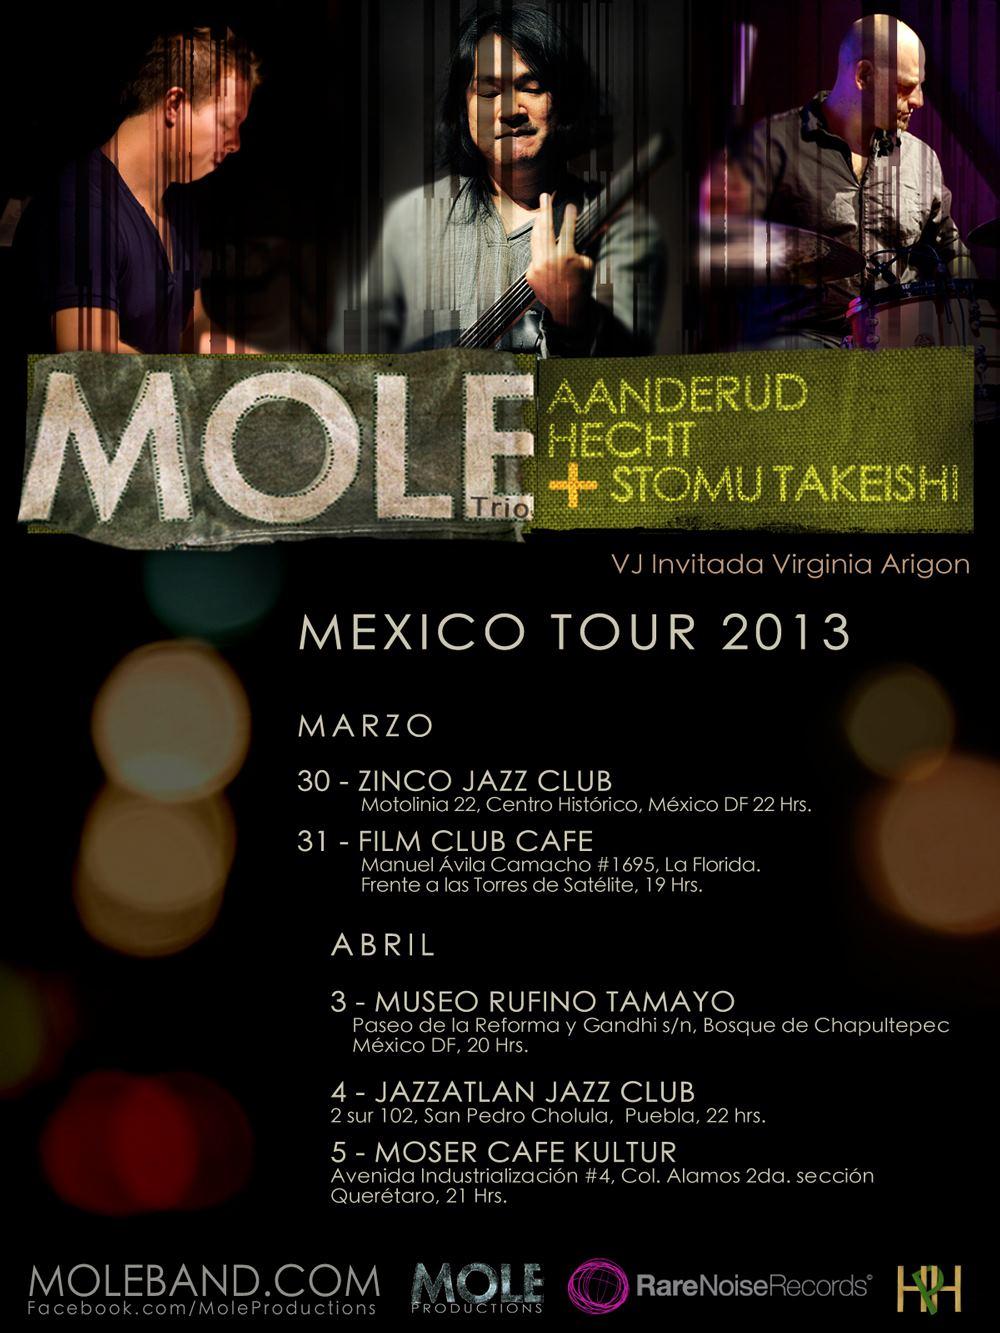 MOLE Trio - Mark Aanderud, Hernan Hecht and Stomu Takeishi on Tour 1